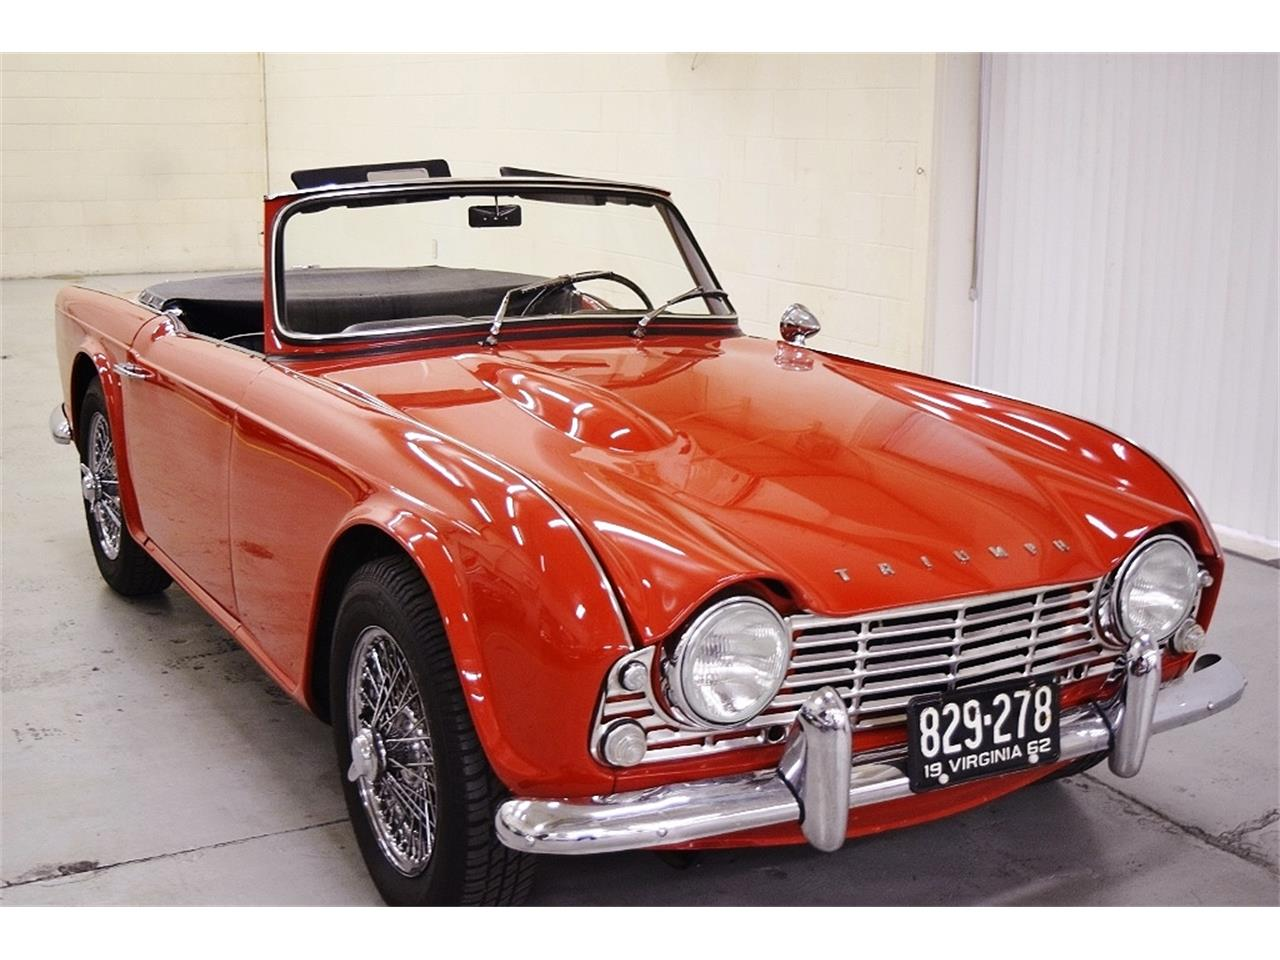 1962 Triumph Tr4 For Sale Classiccarscom Cc 1171591